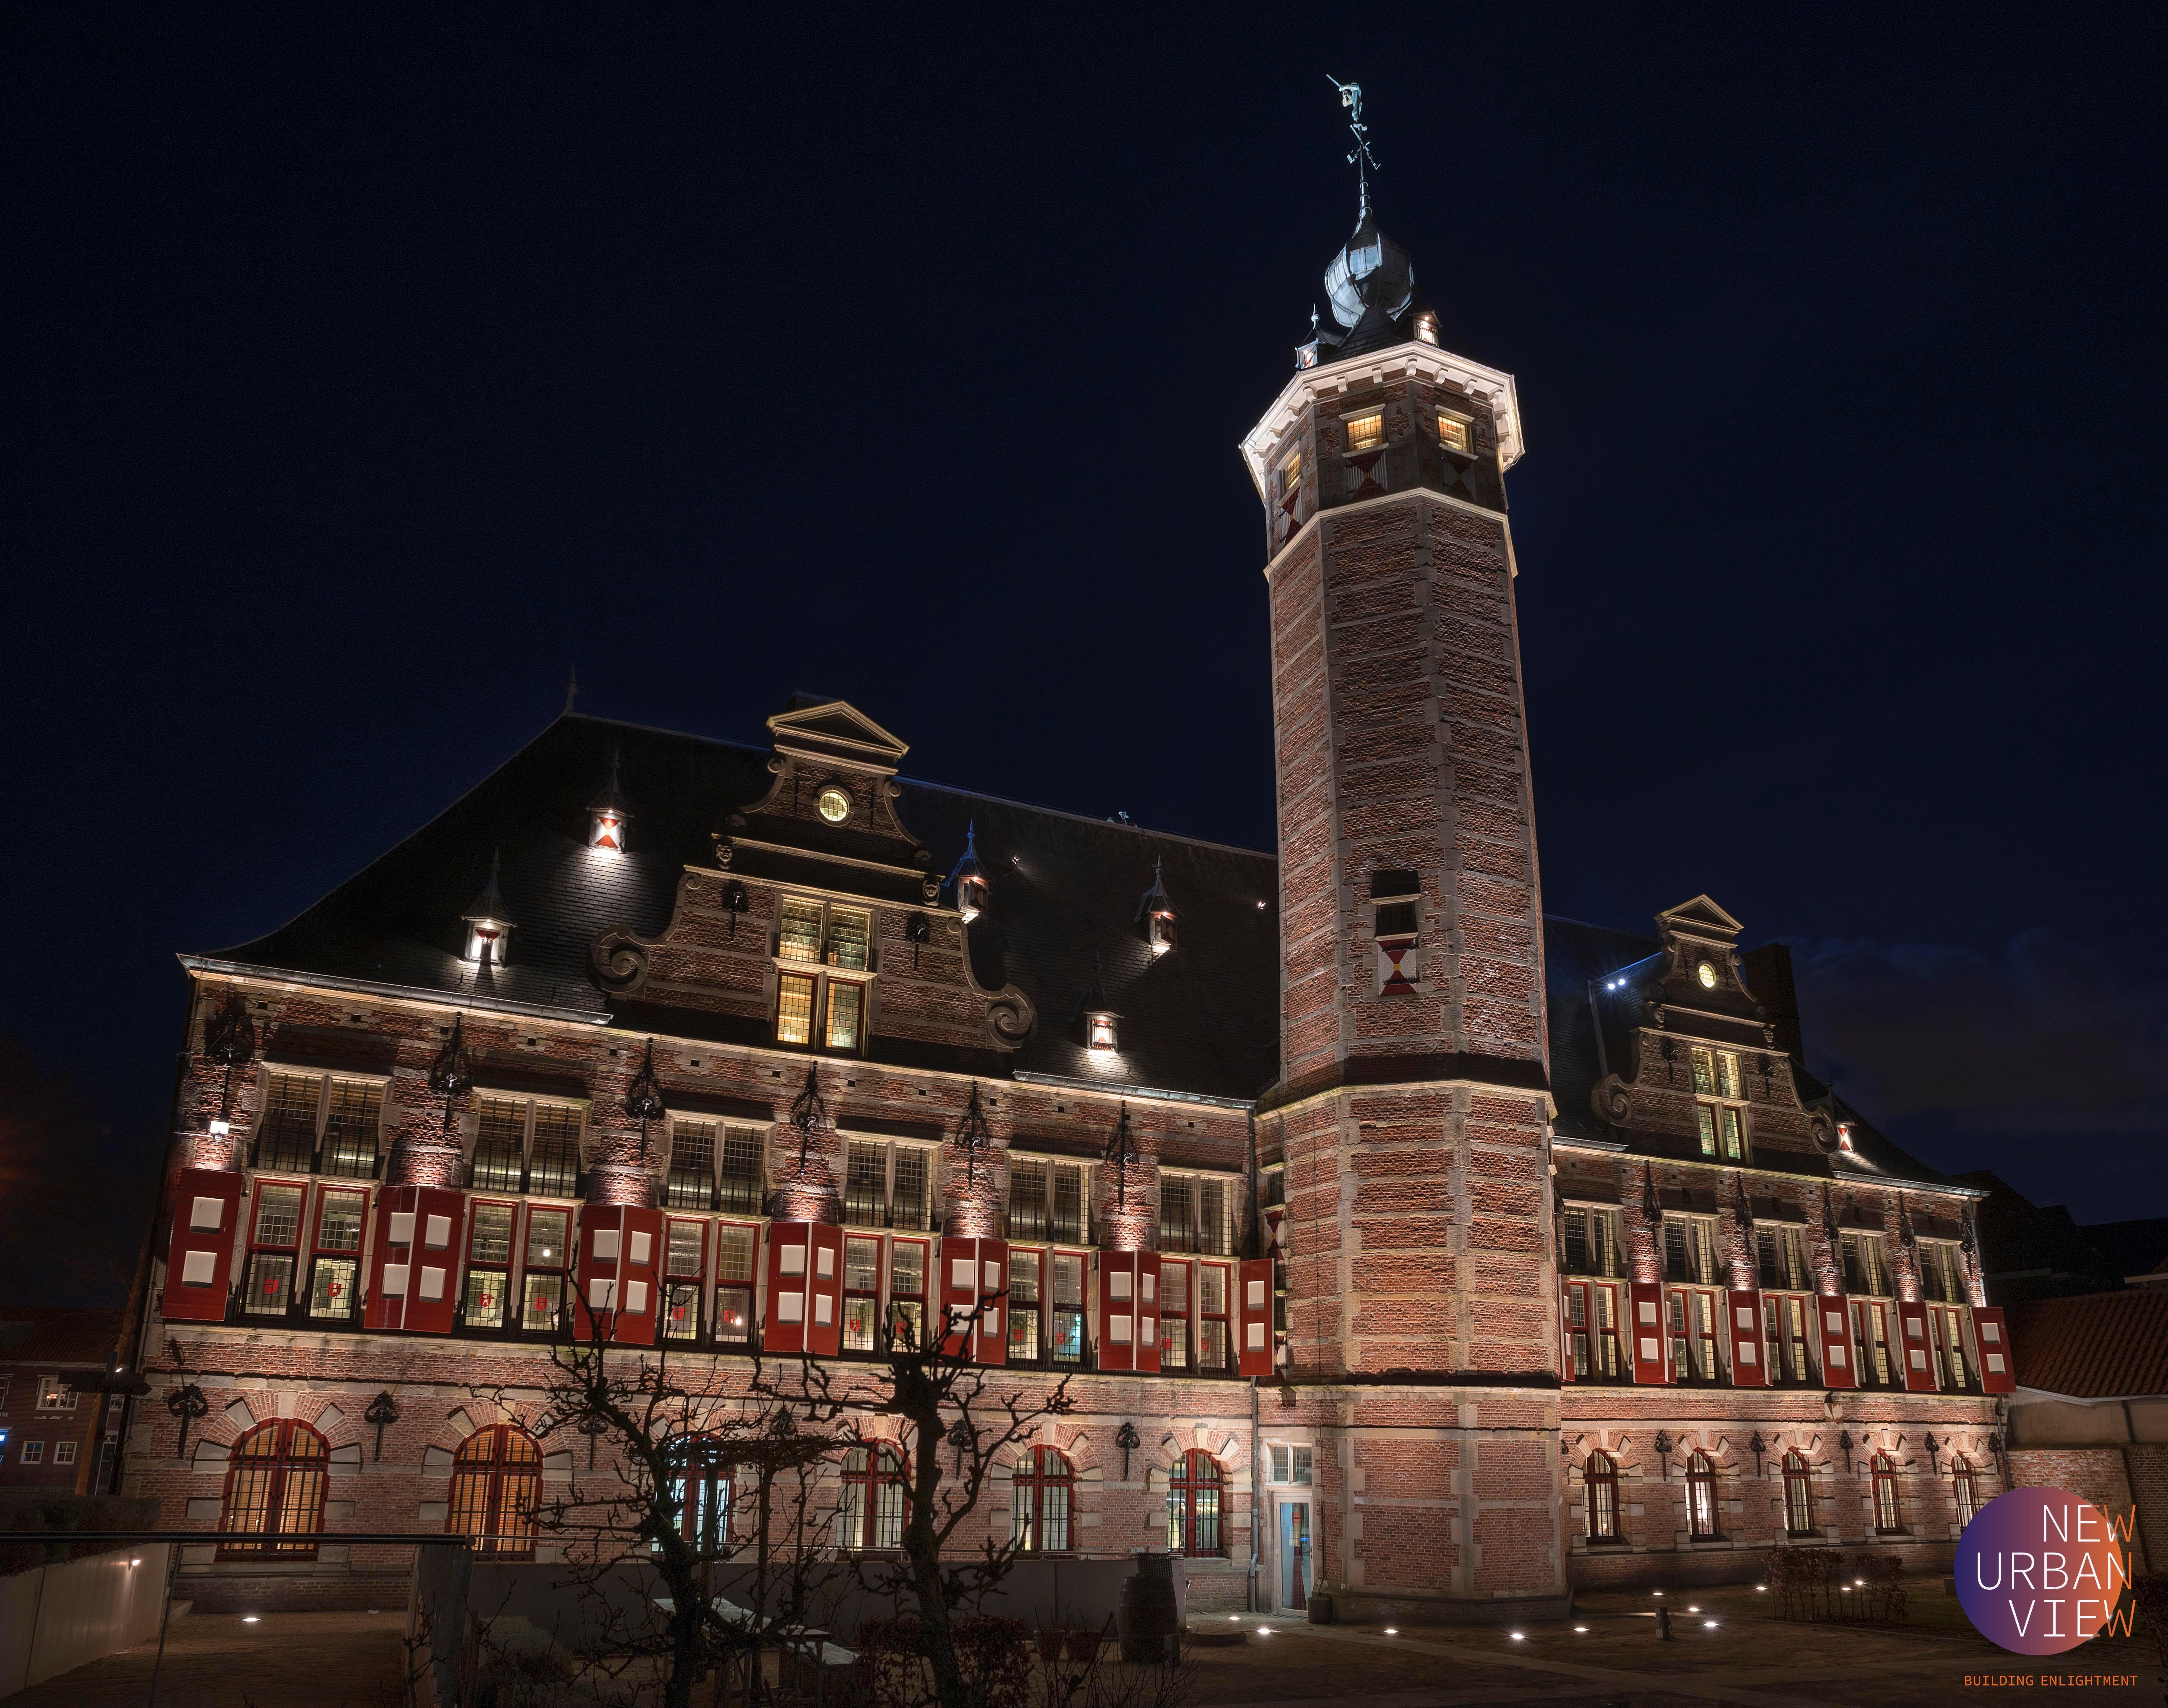 NEWURBANVIEW-architectural-lighting-Kloveniersdoelen-Middelburg-jeroen-jans-2